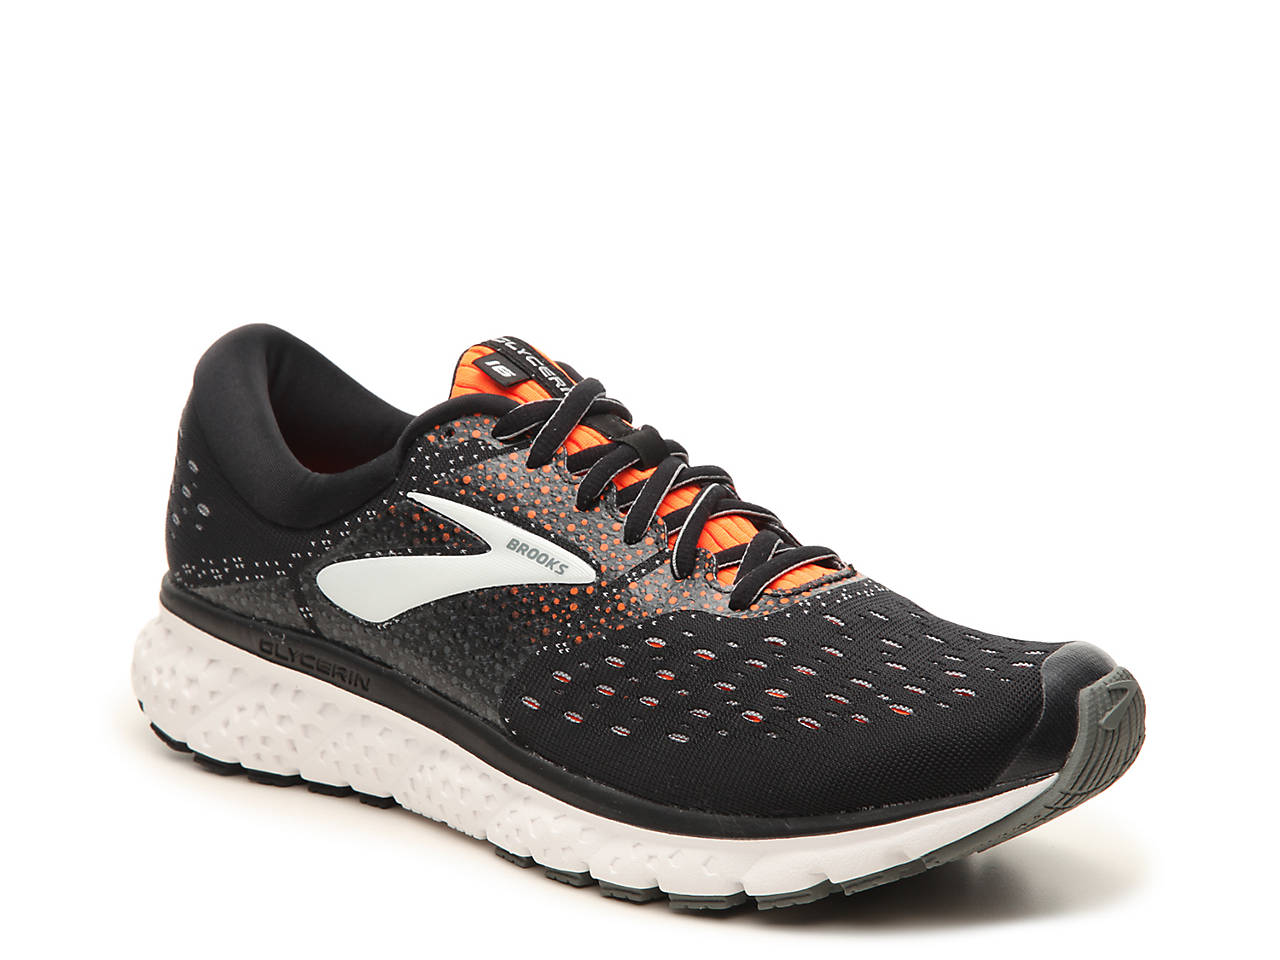 9a33961f2fd Brooks Glycerin 16 Running Shoe - Men s Men s Shoes